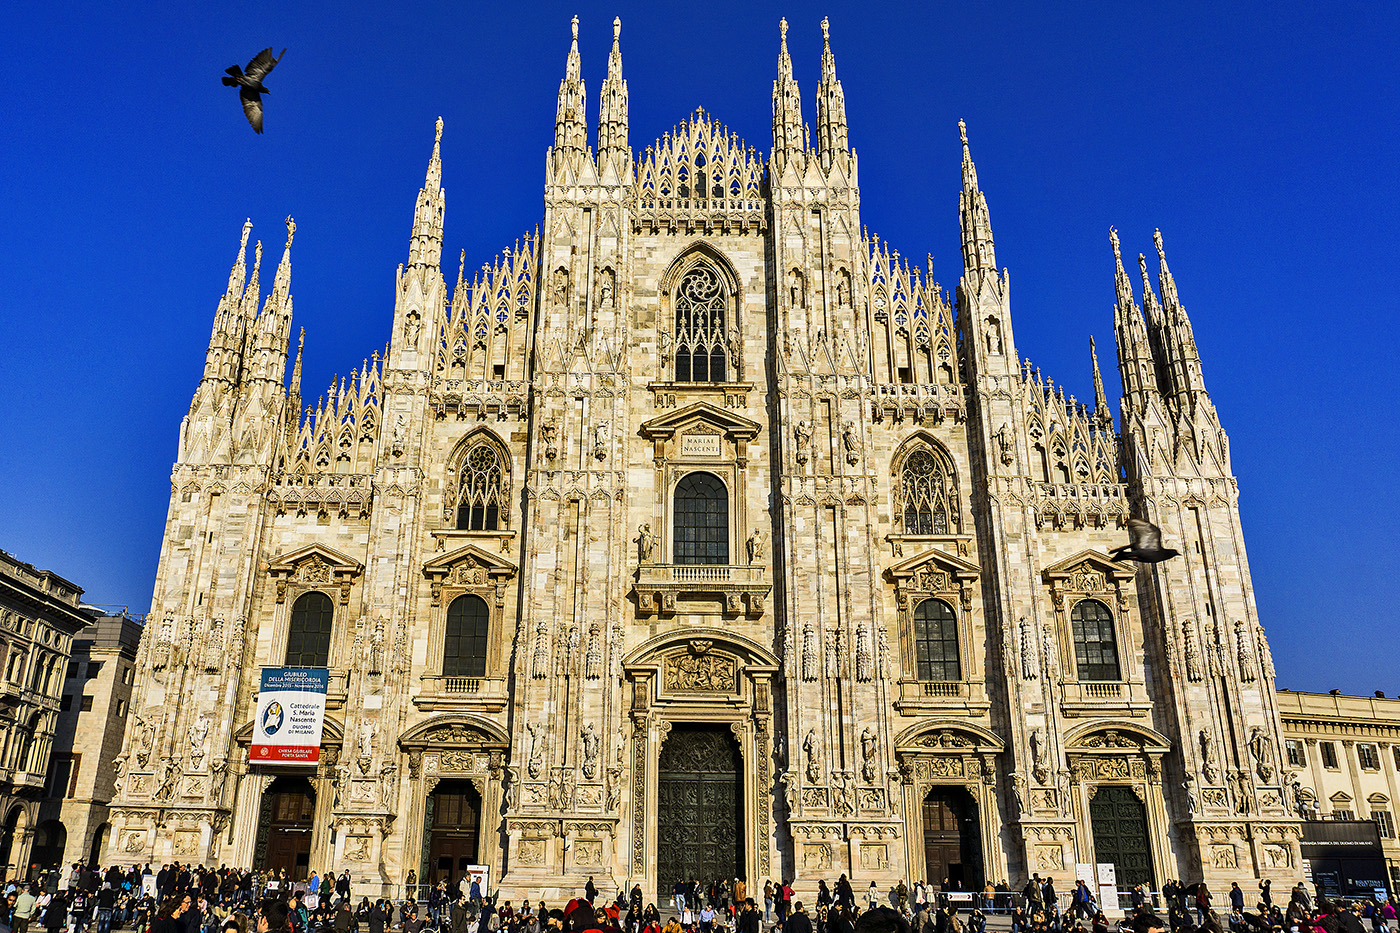 Duomo di Milano Cathedral of Milan